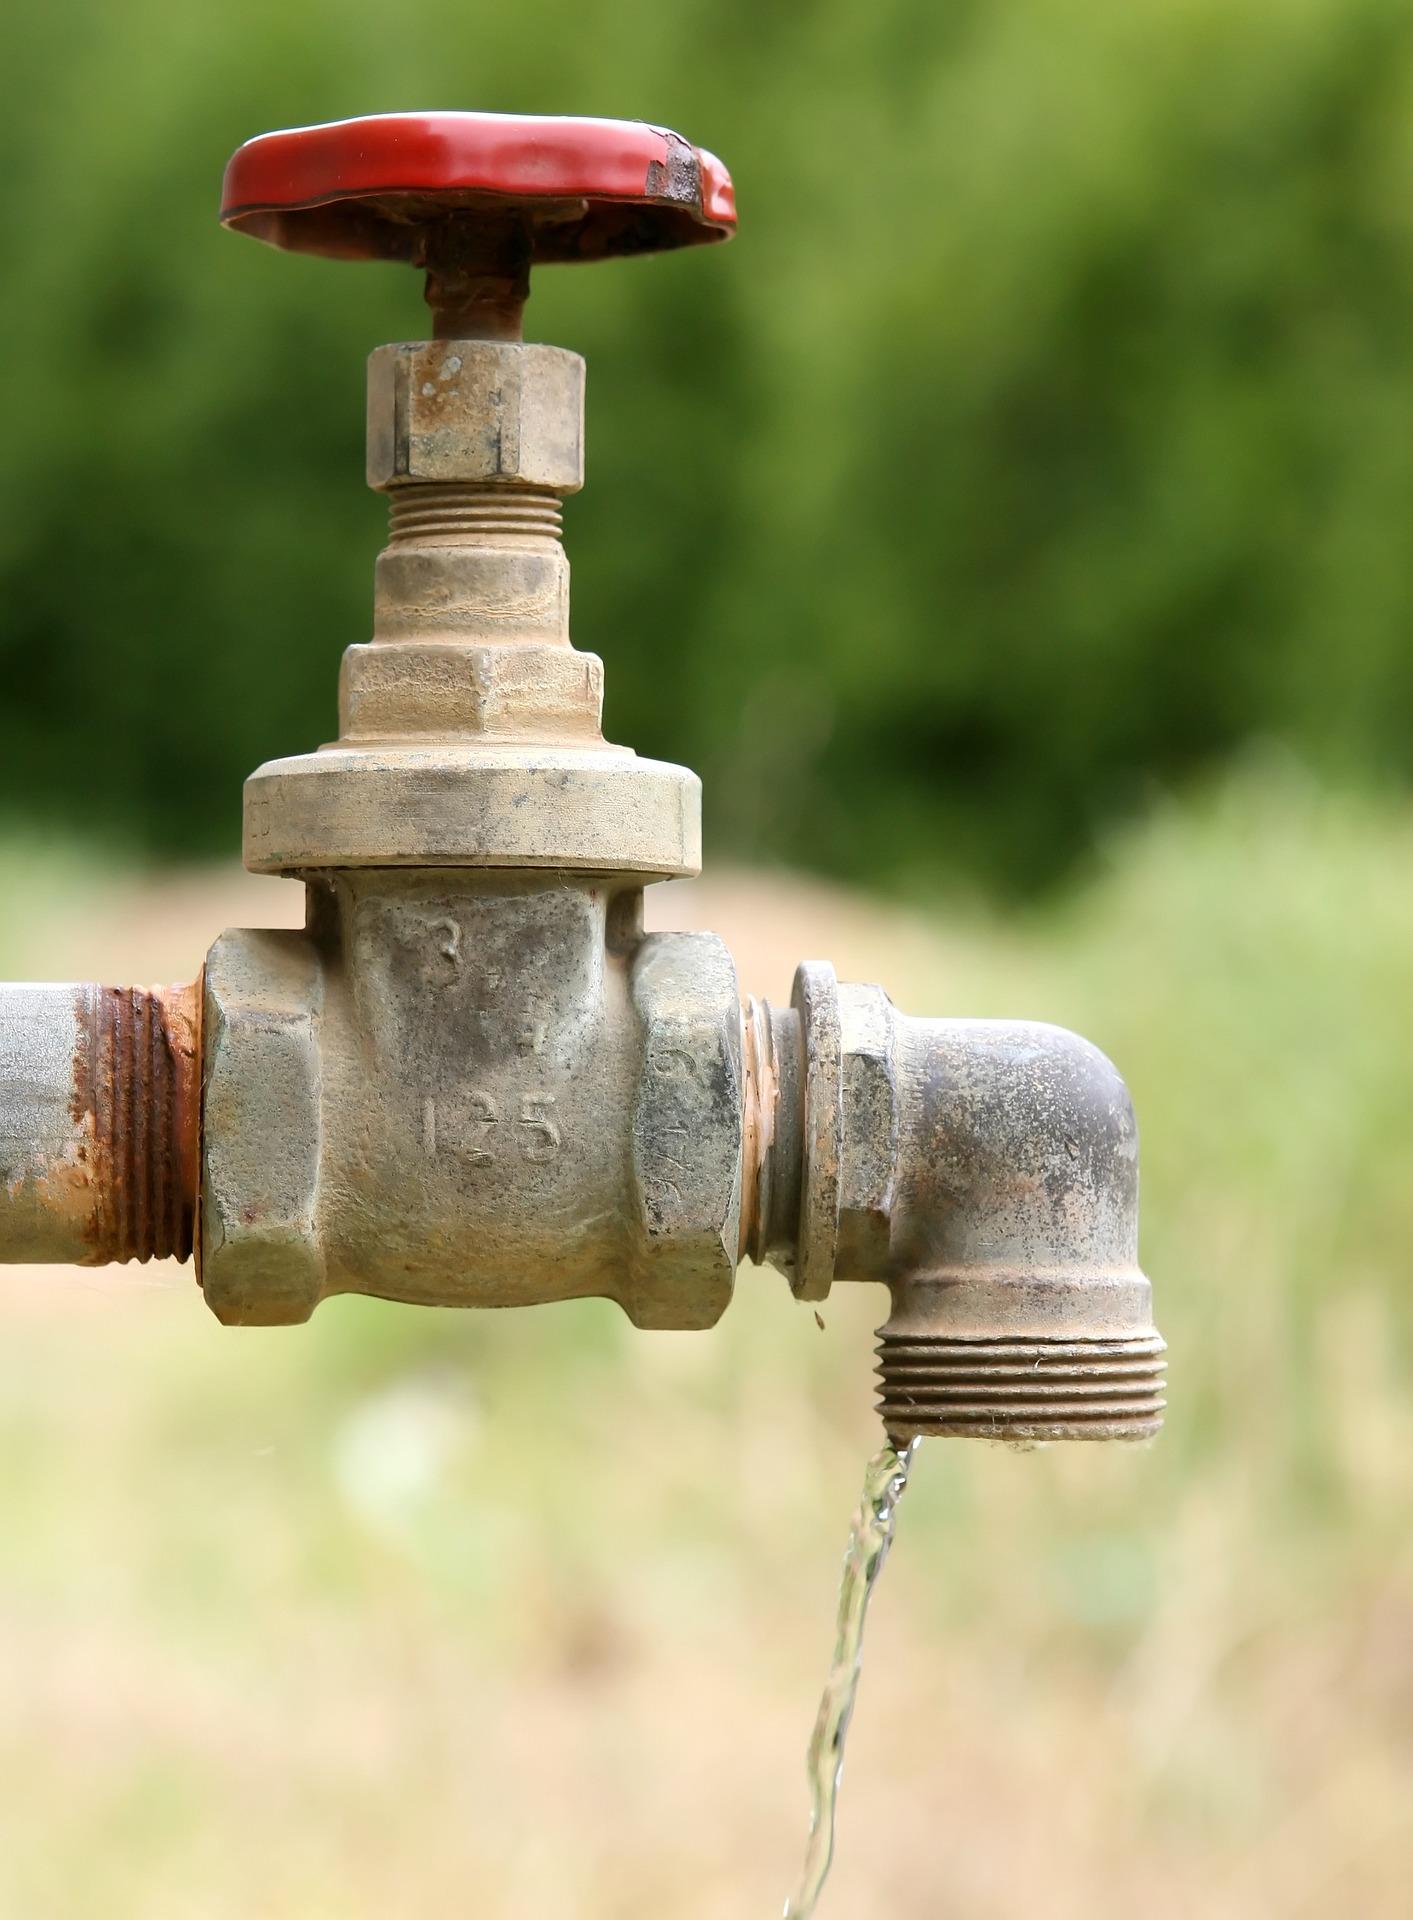 Rv Water Pressure Regulator Water Pressure Problems Read This Rvshare Com